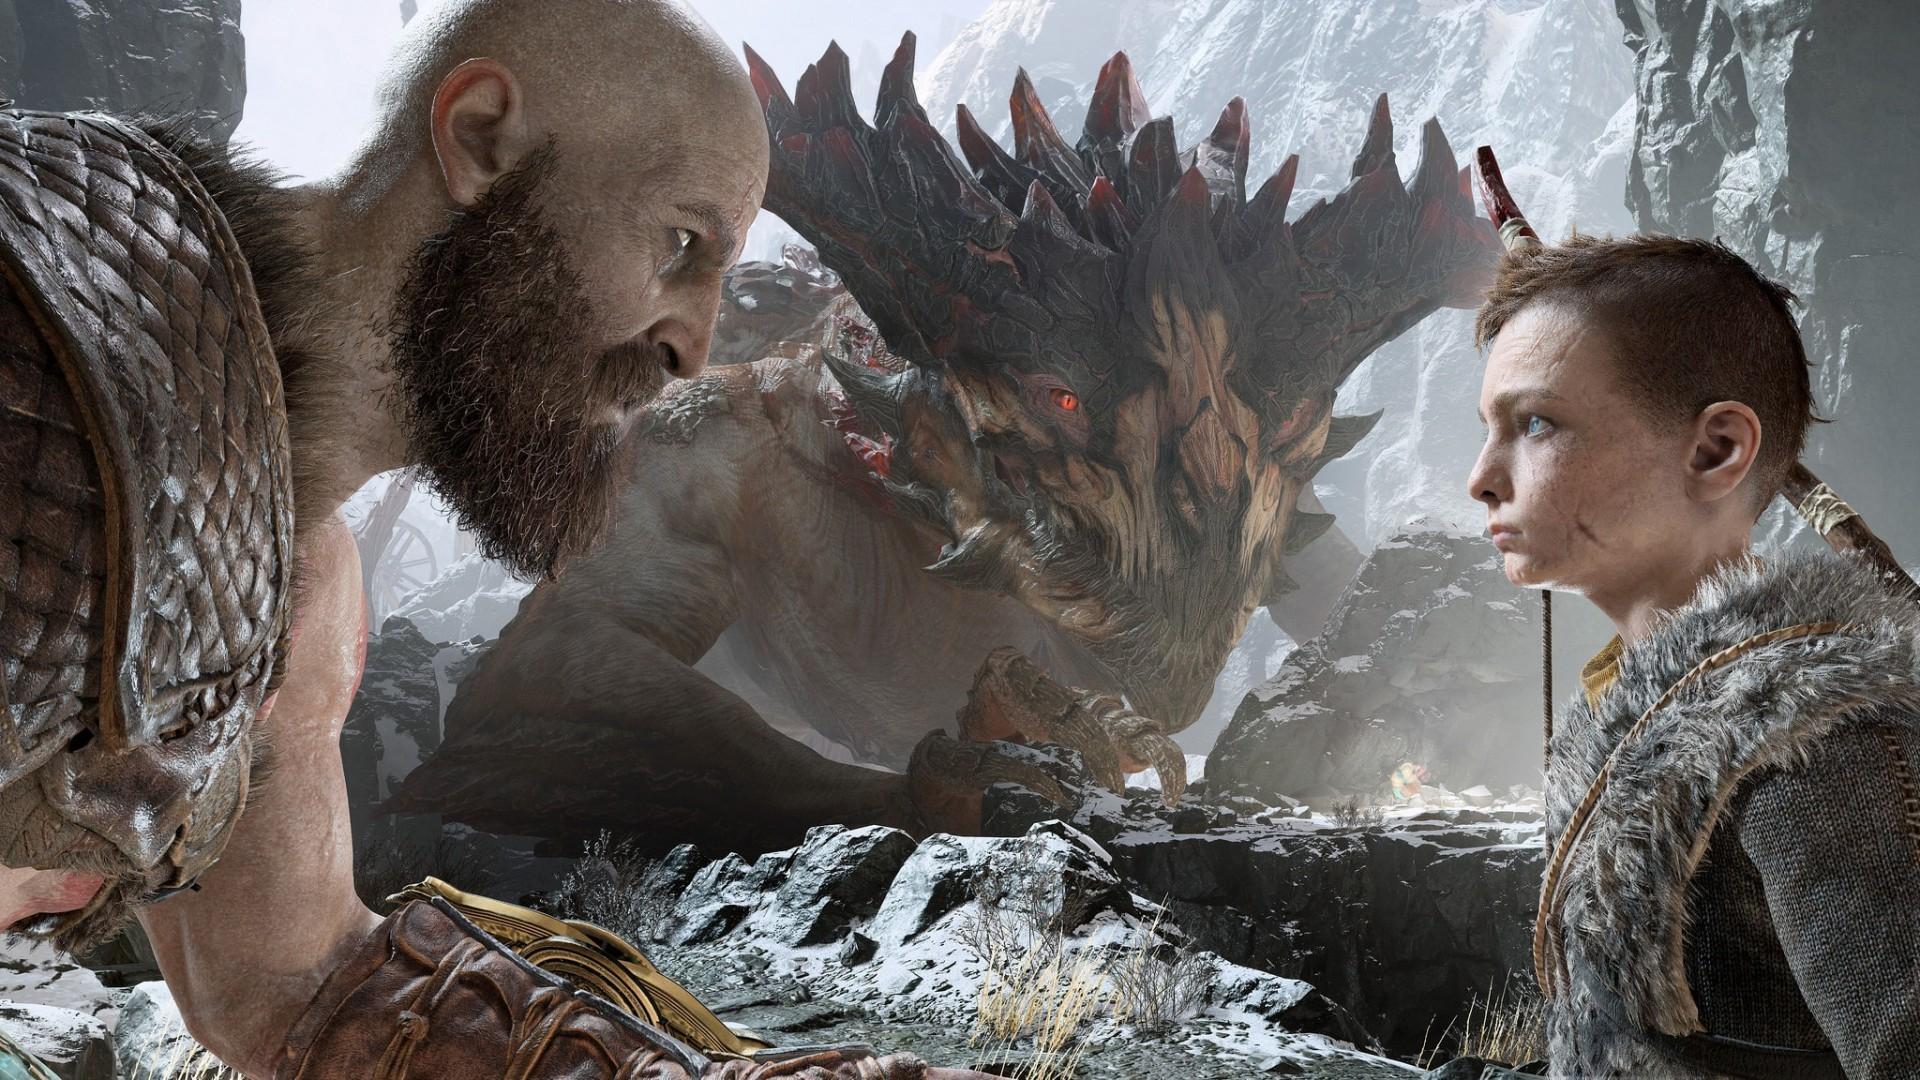 NPD分析师预测《GTA5》将称霸两大主机游戏销量榜